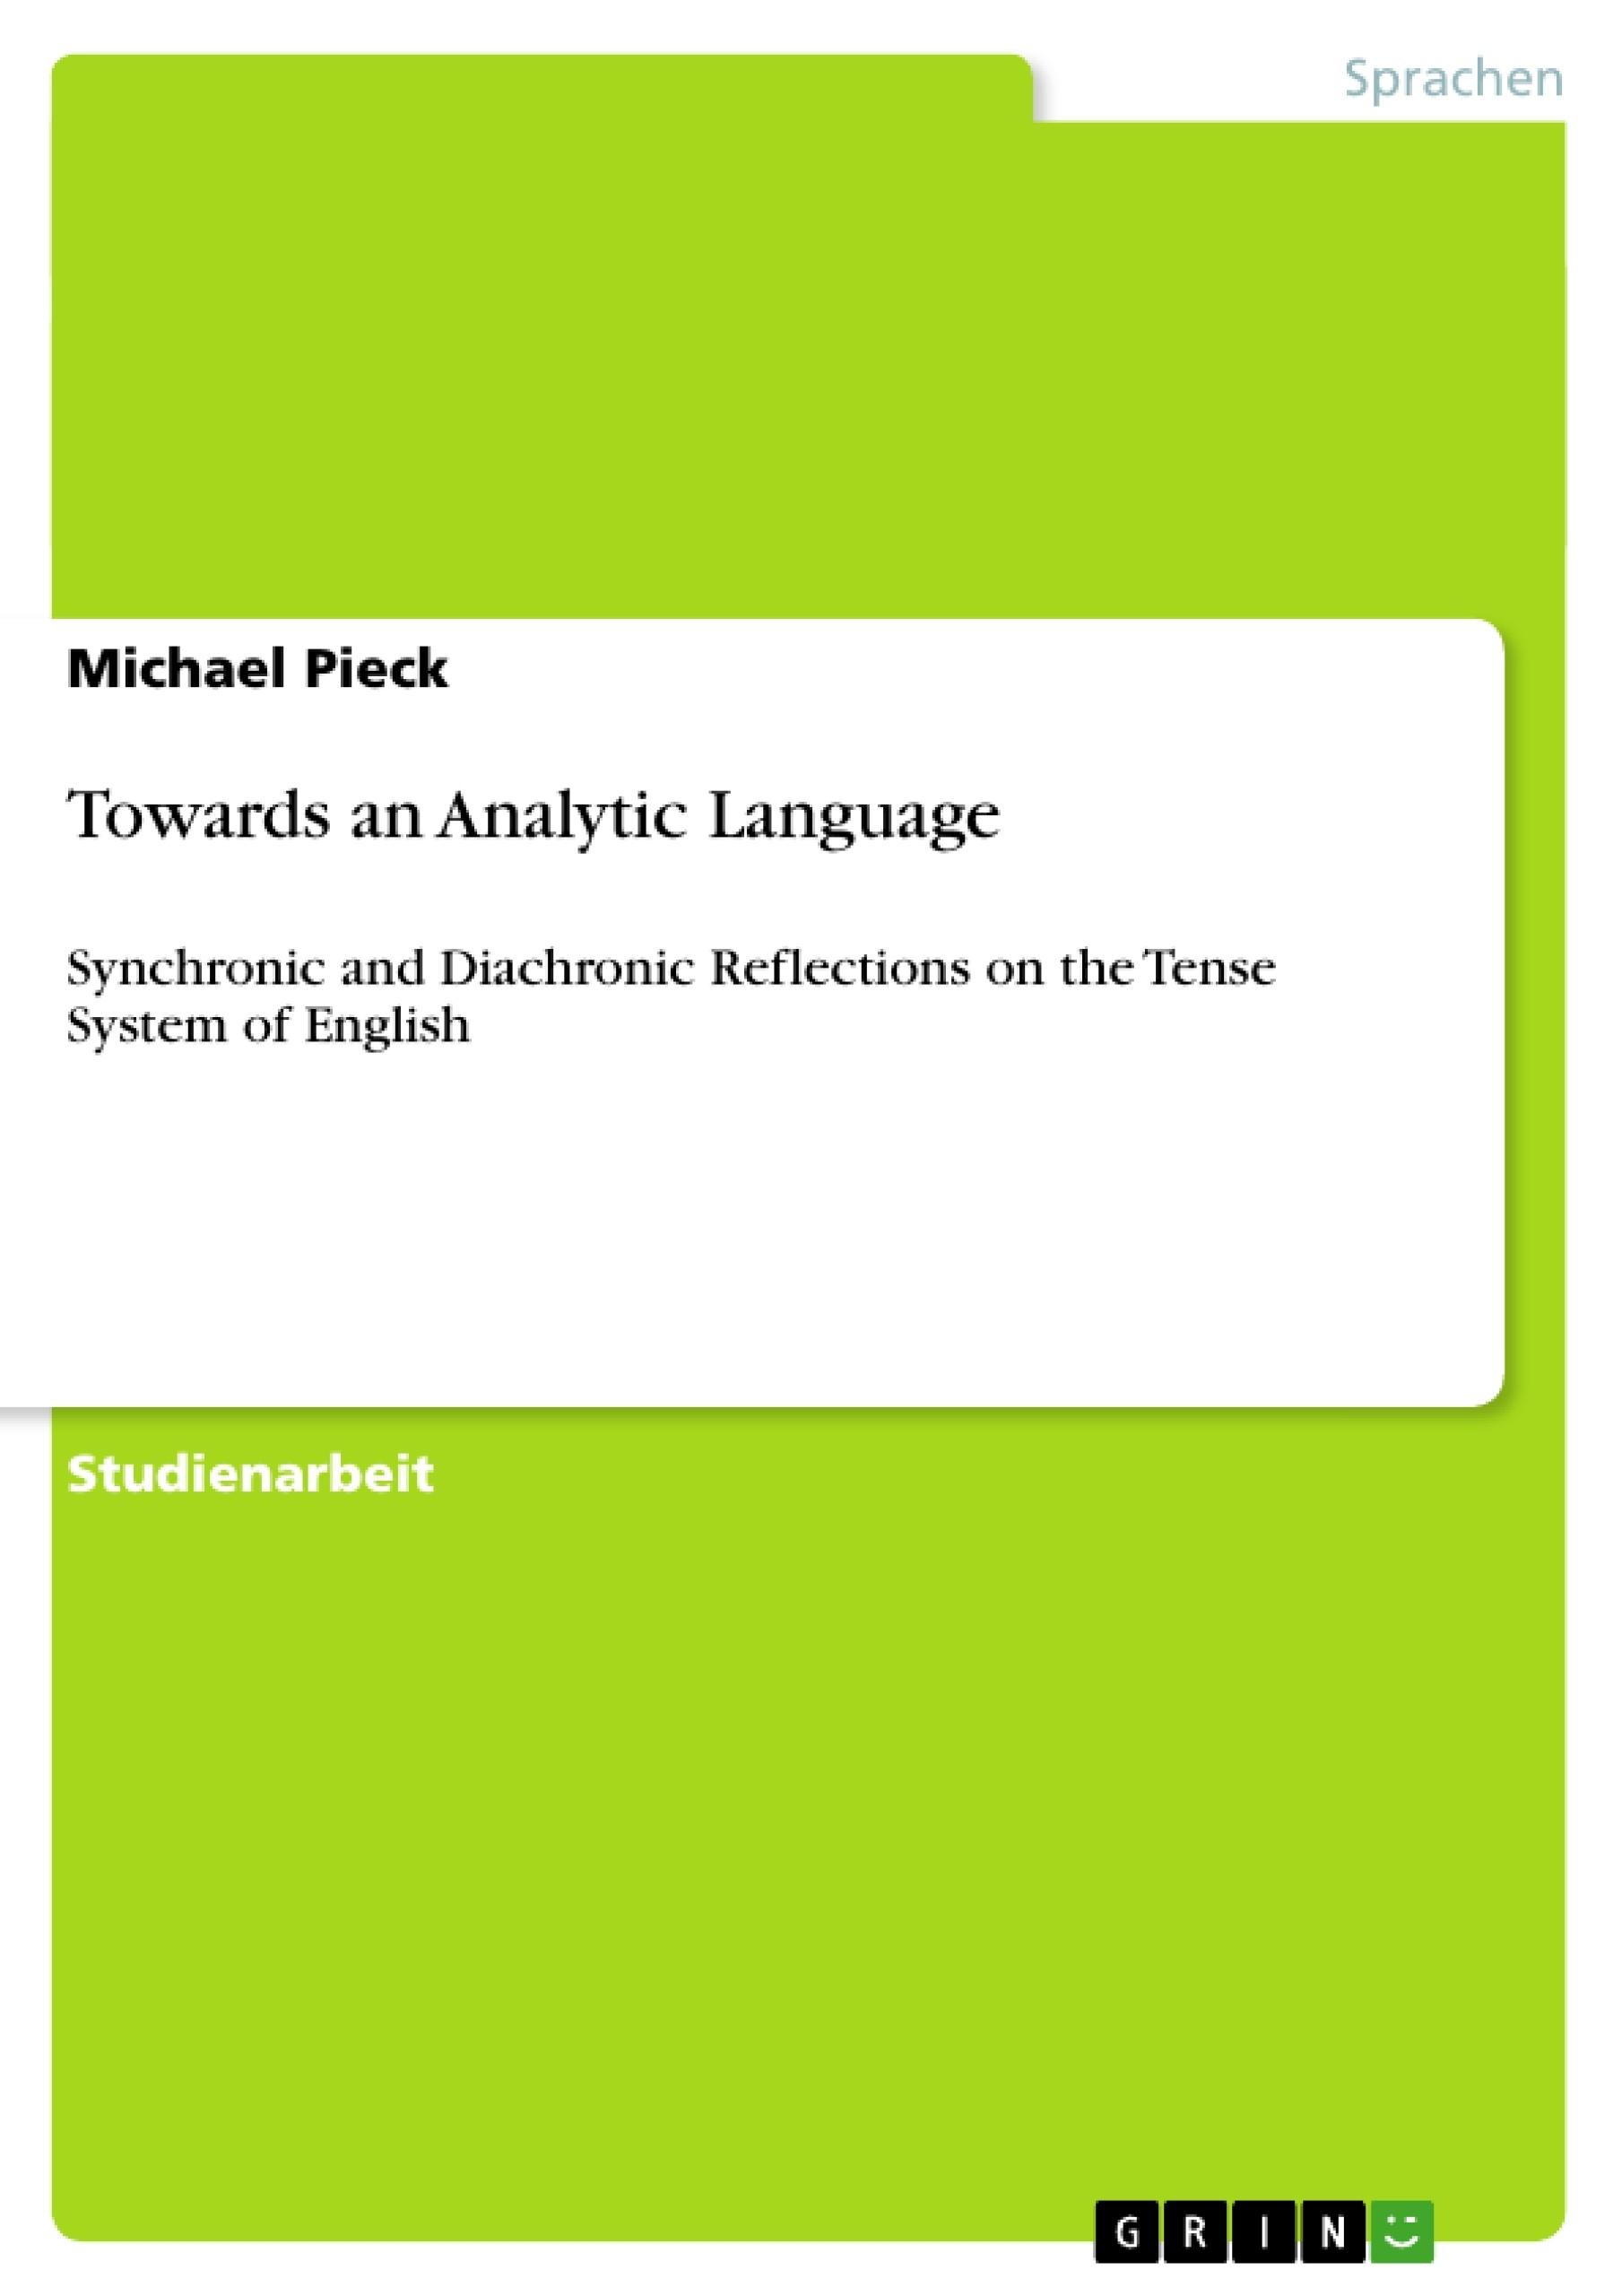 Titel: Towards an Analytic Language